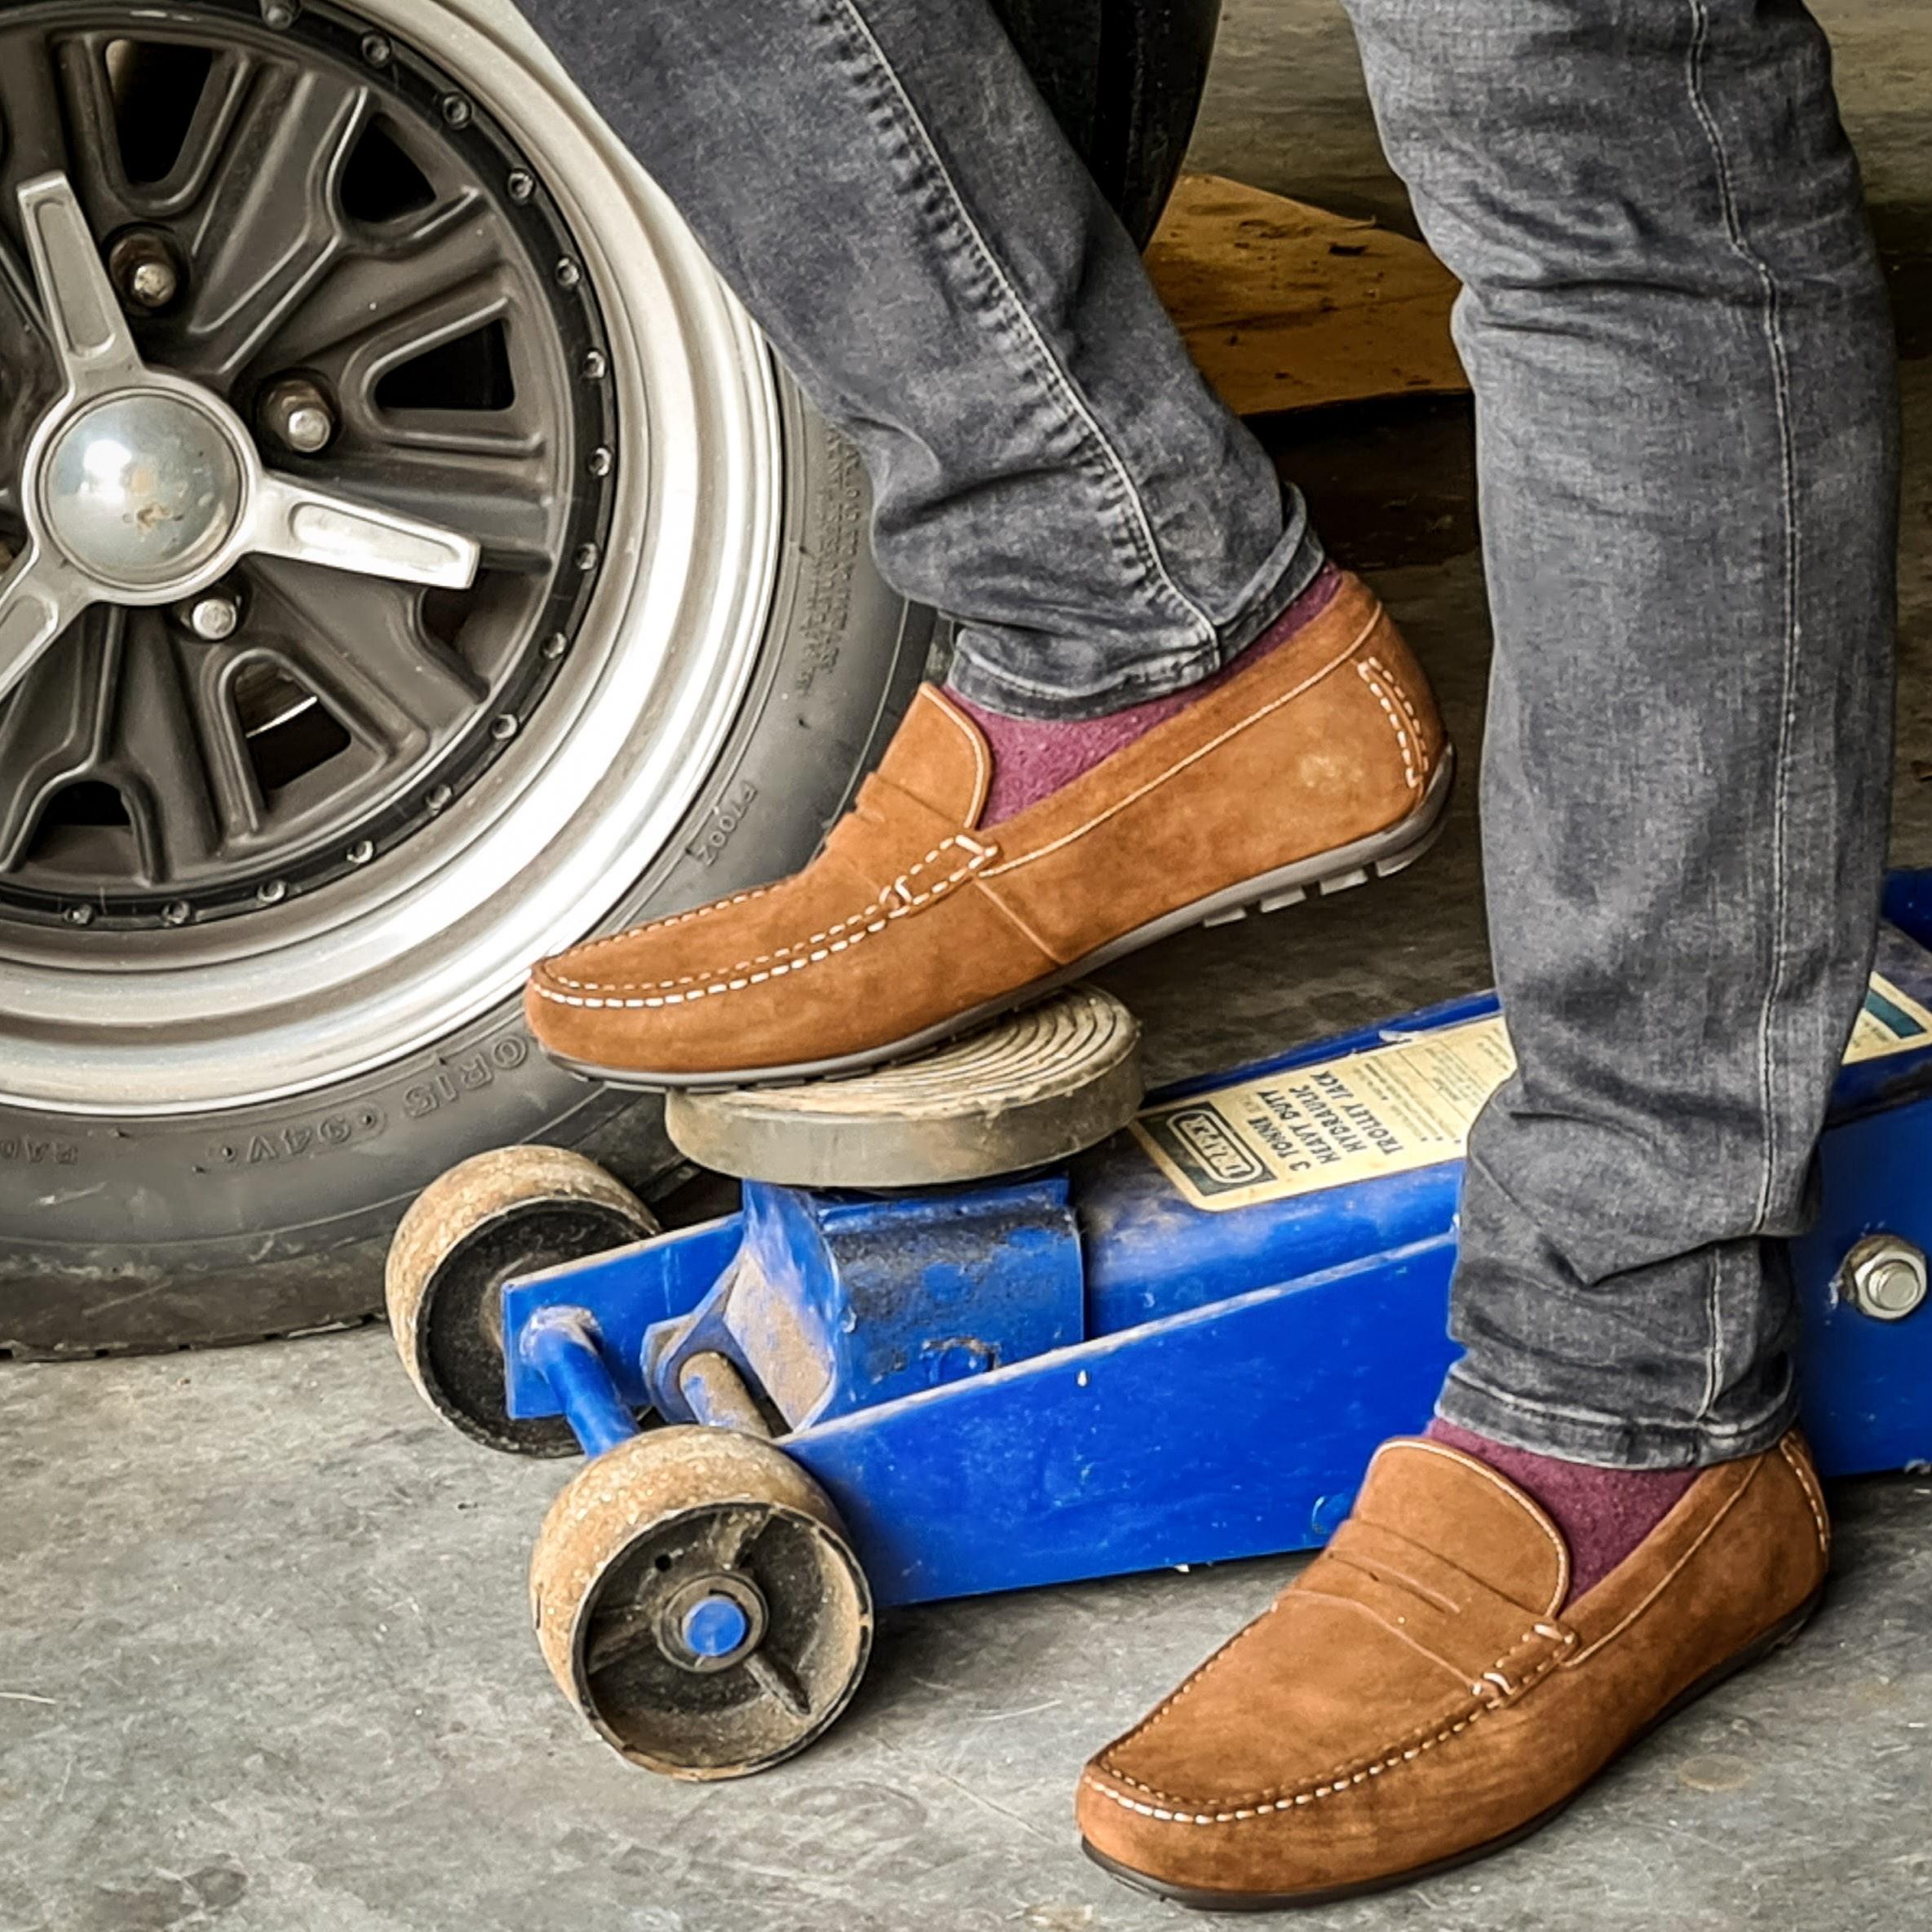 Loake Shoes - Donnington Tan Suede image #1